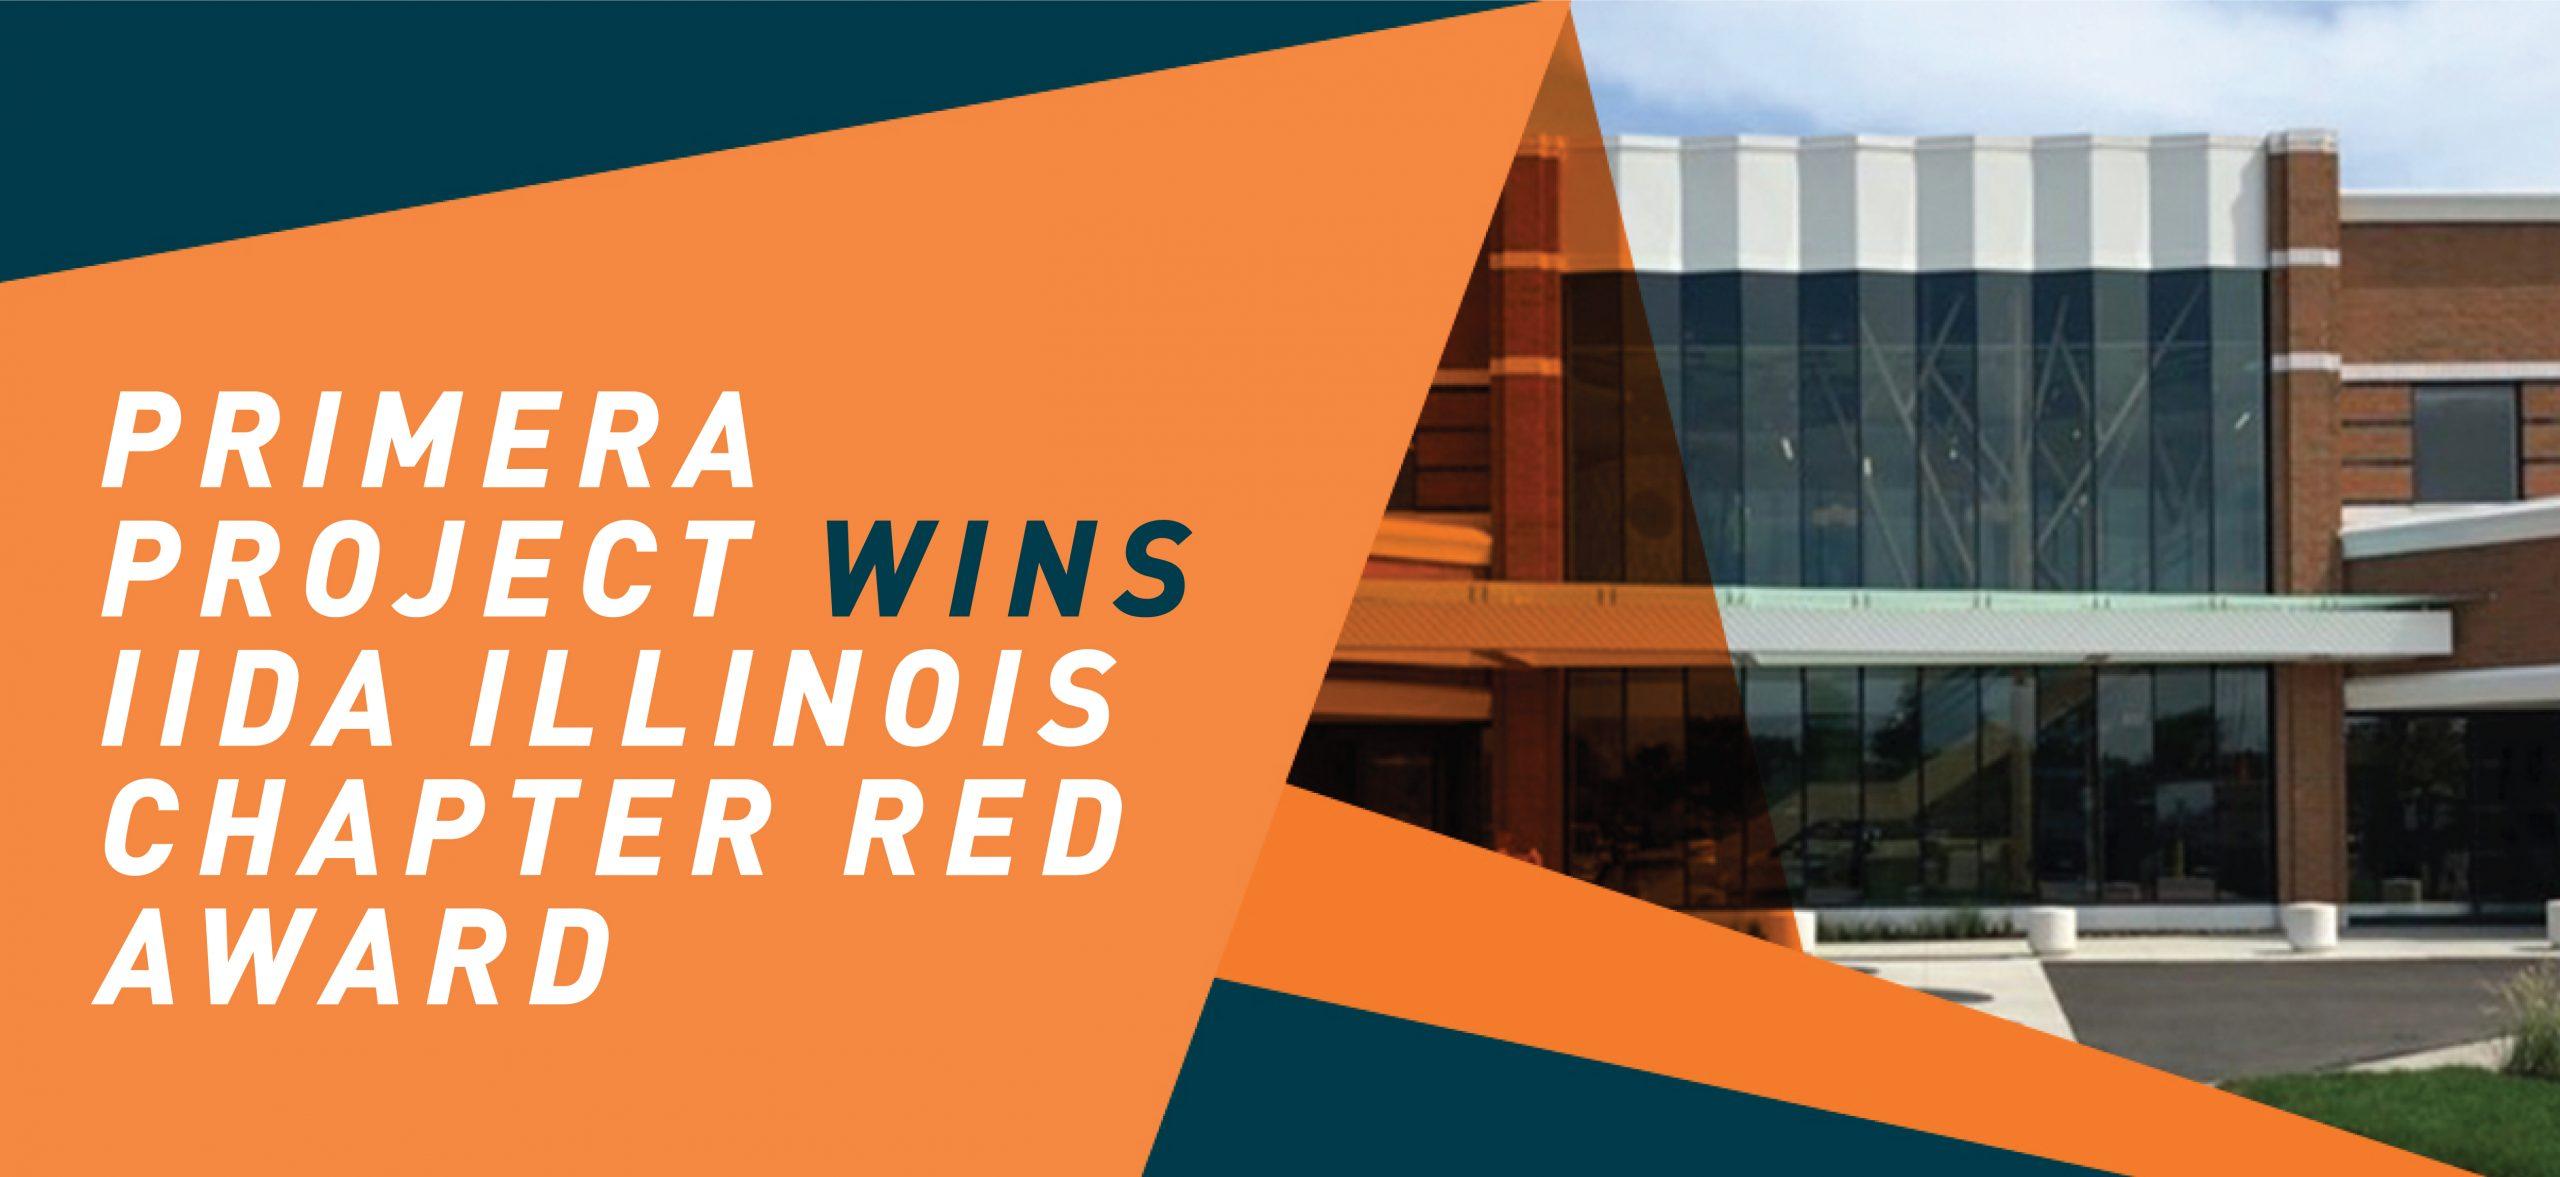 Primera Project Wins IIDA Illinois Chapter RED Award